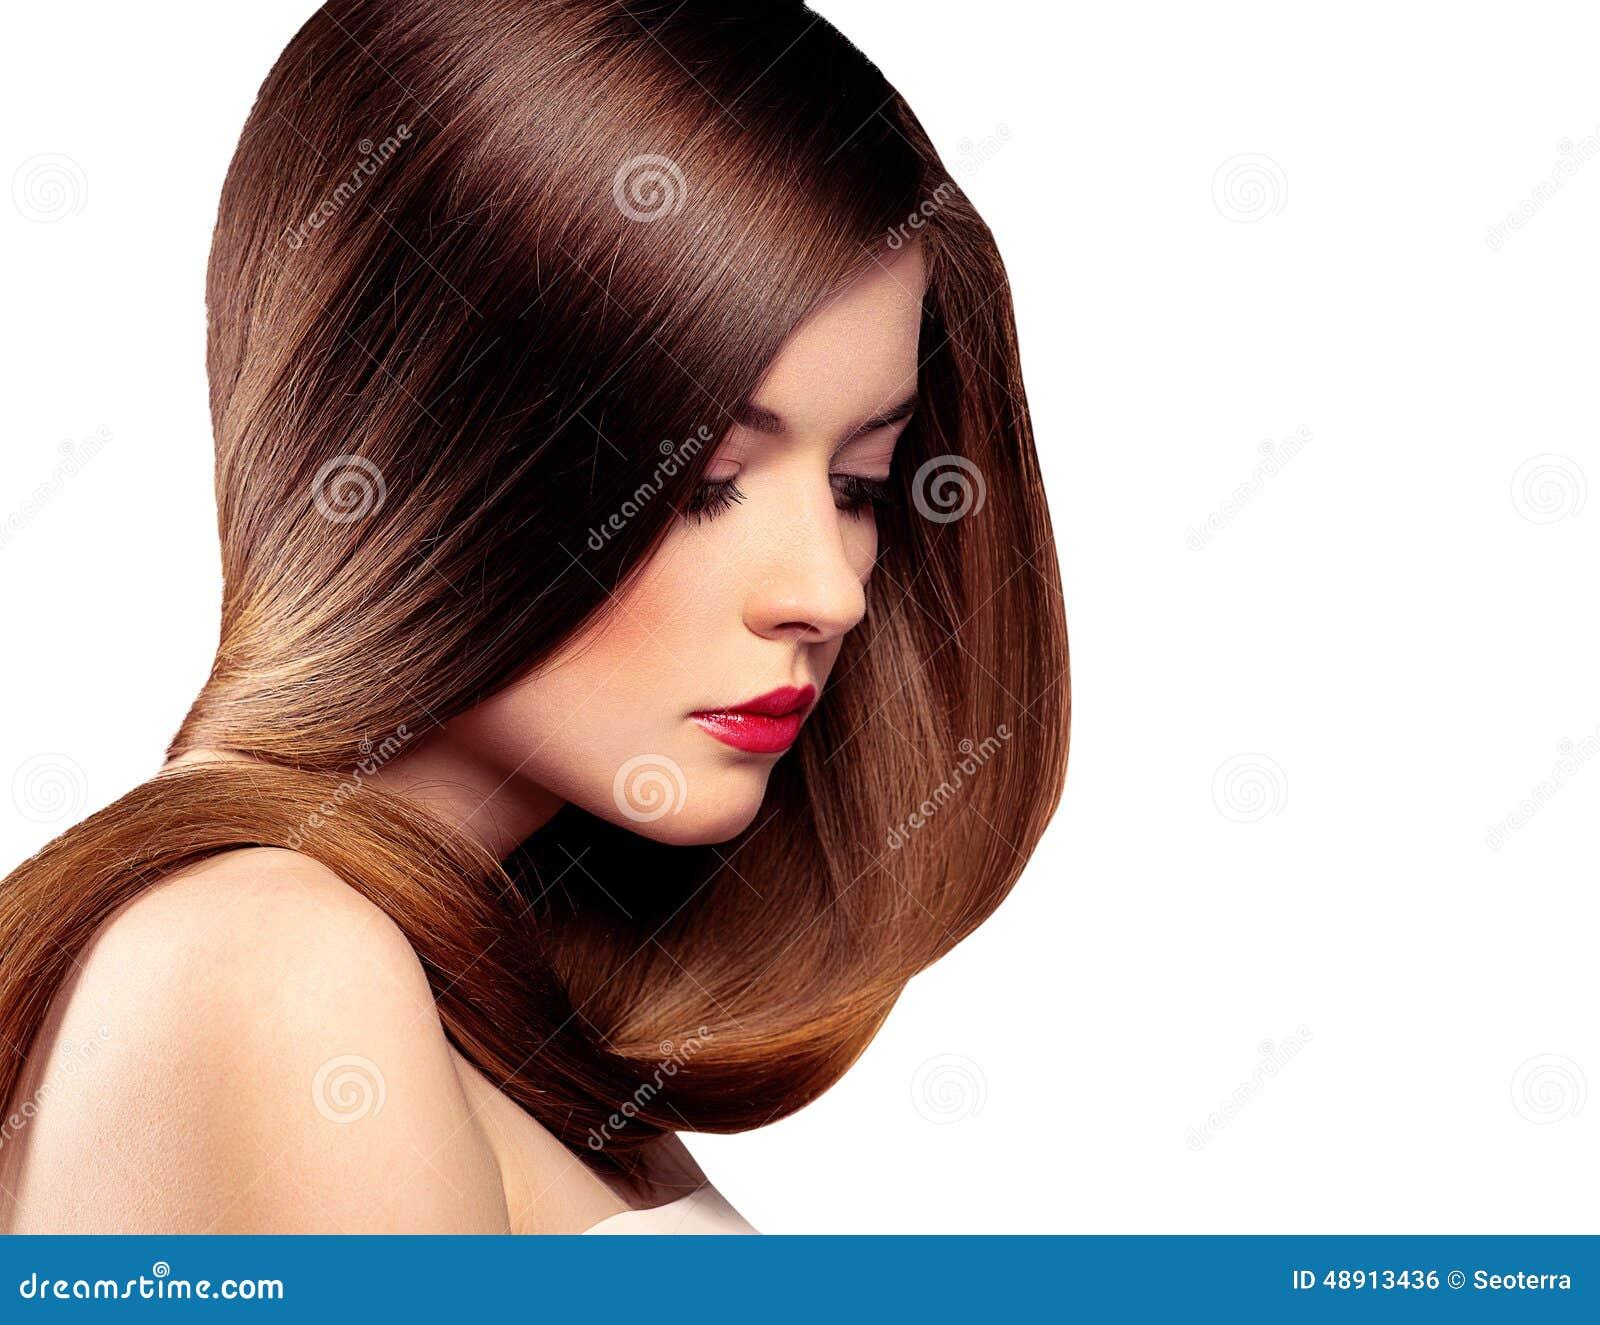 Long Hair Model Stock Photo Image Of Facial Perfect 48913436